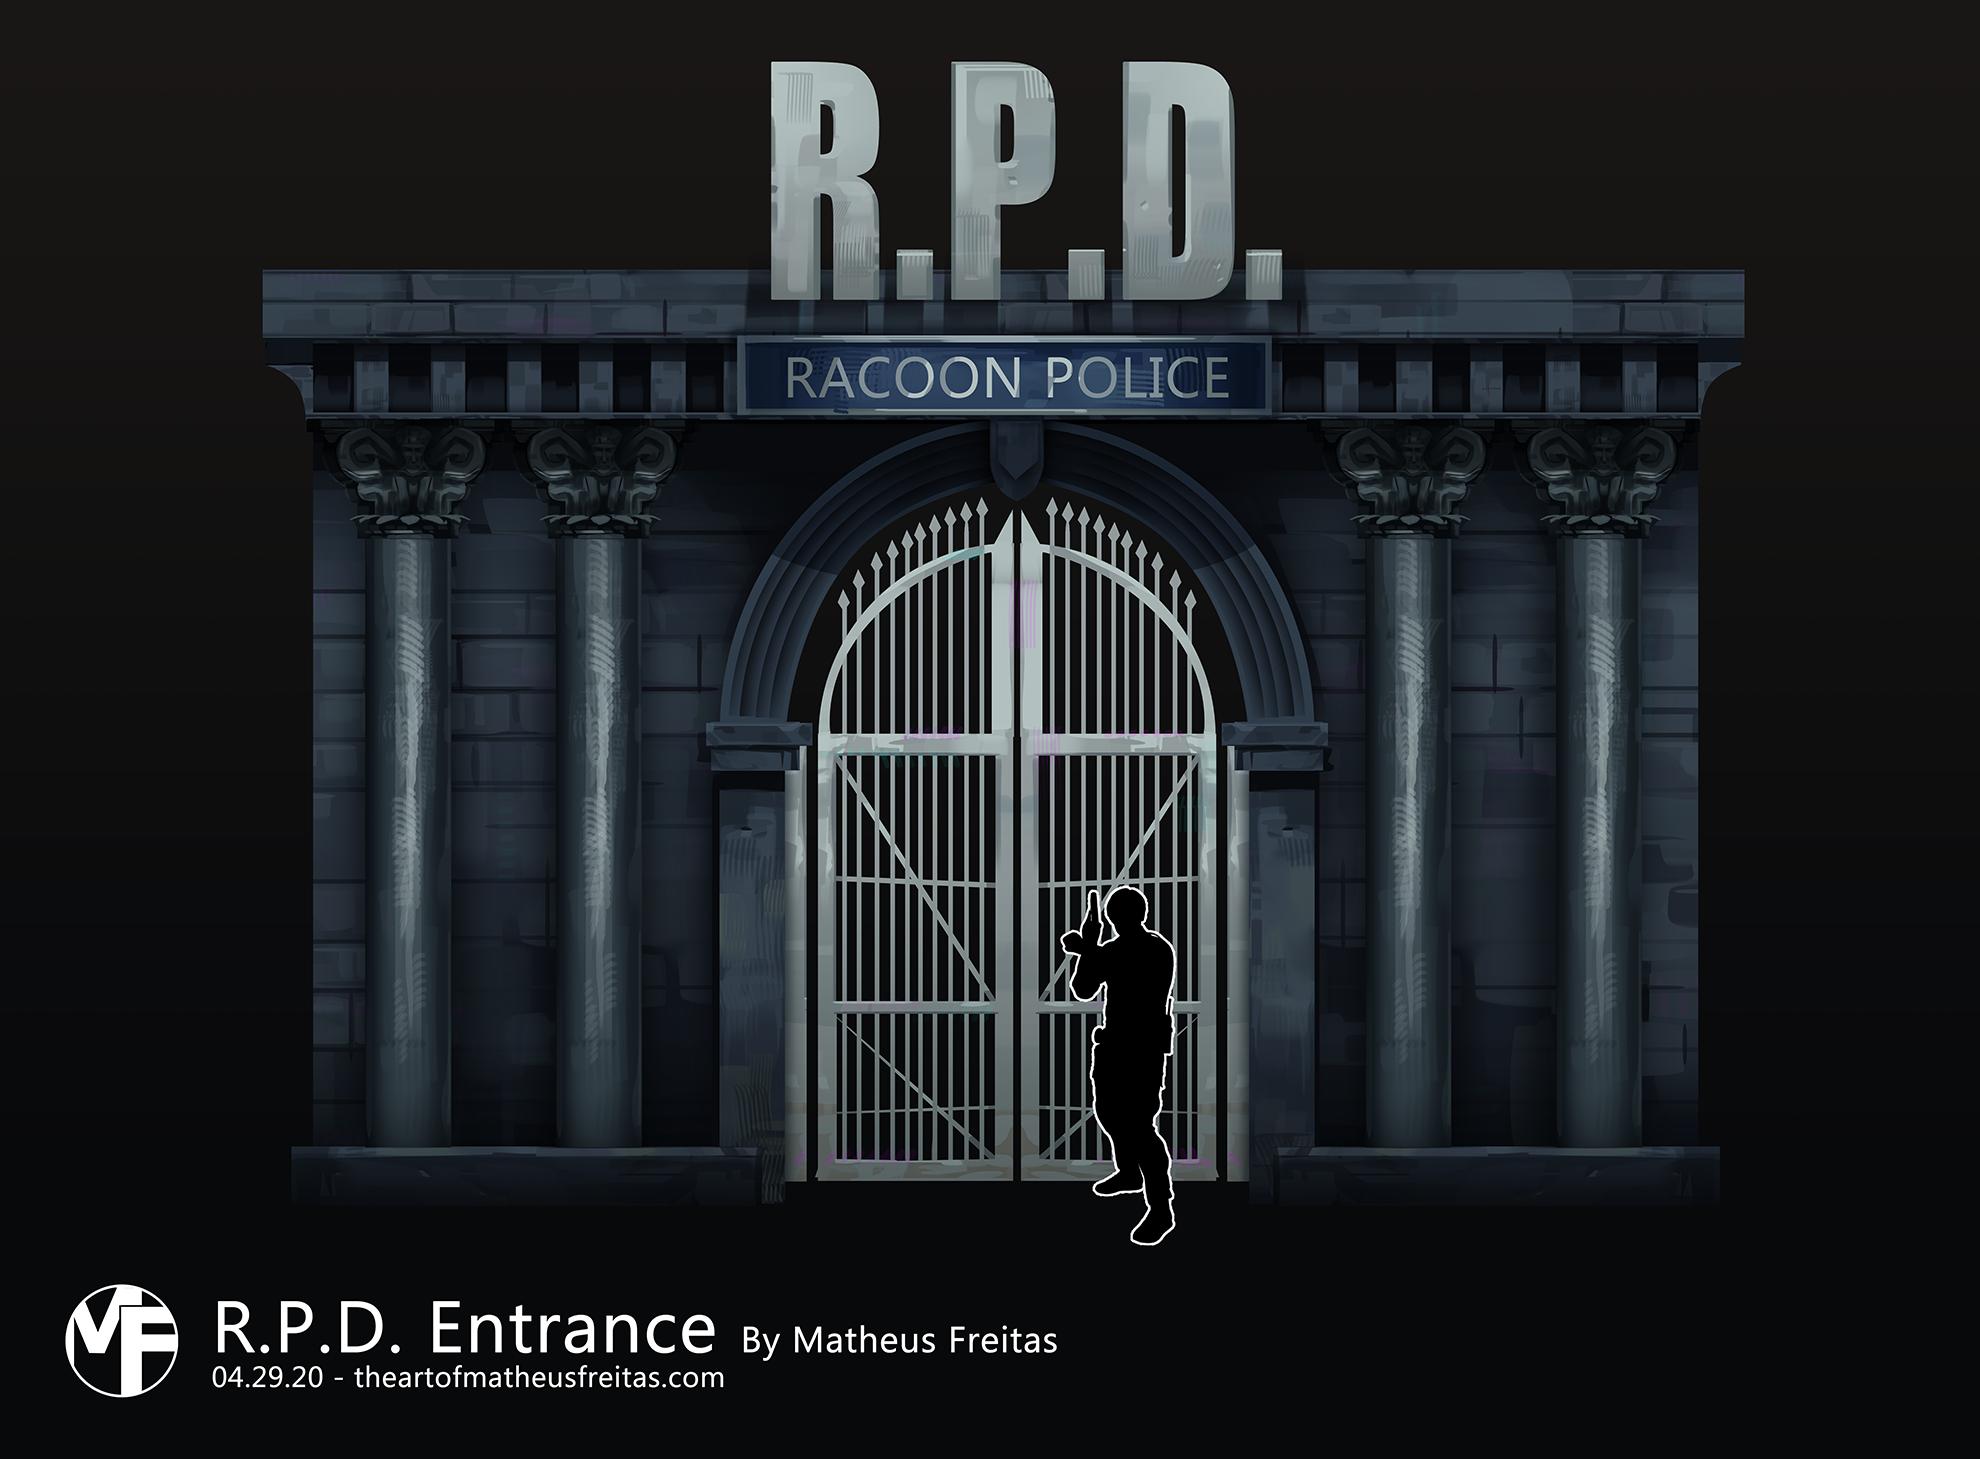 RPD Entrance